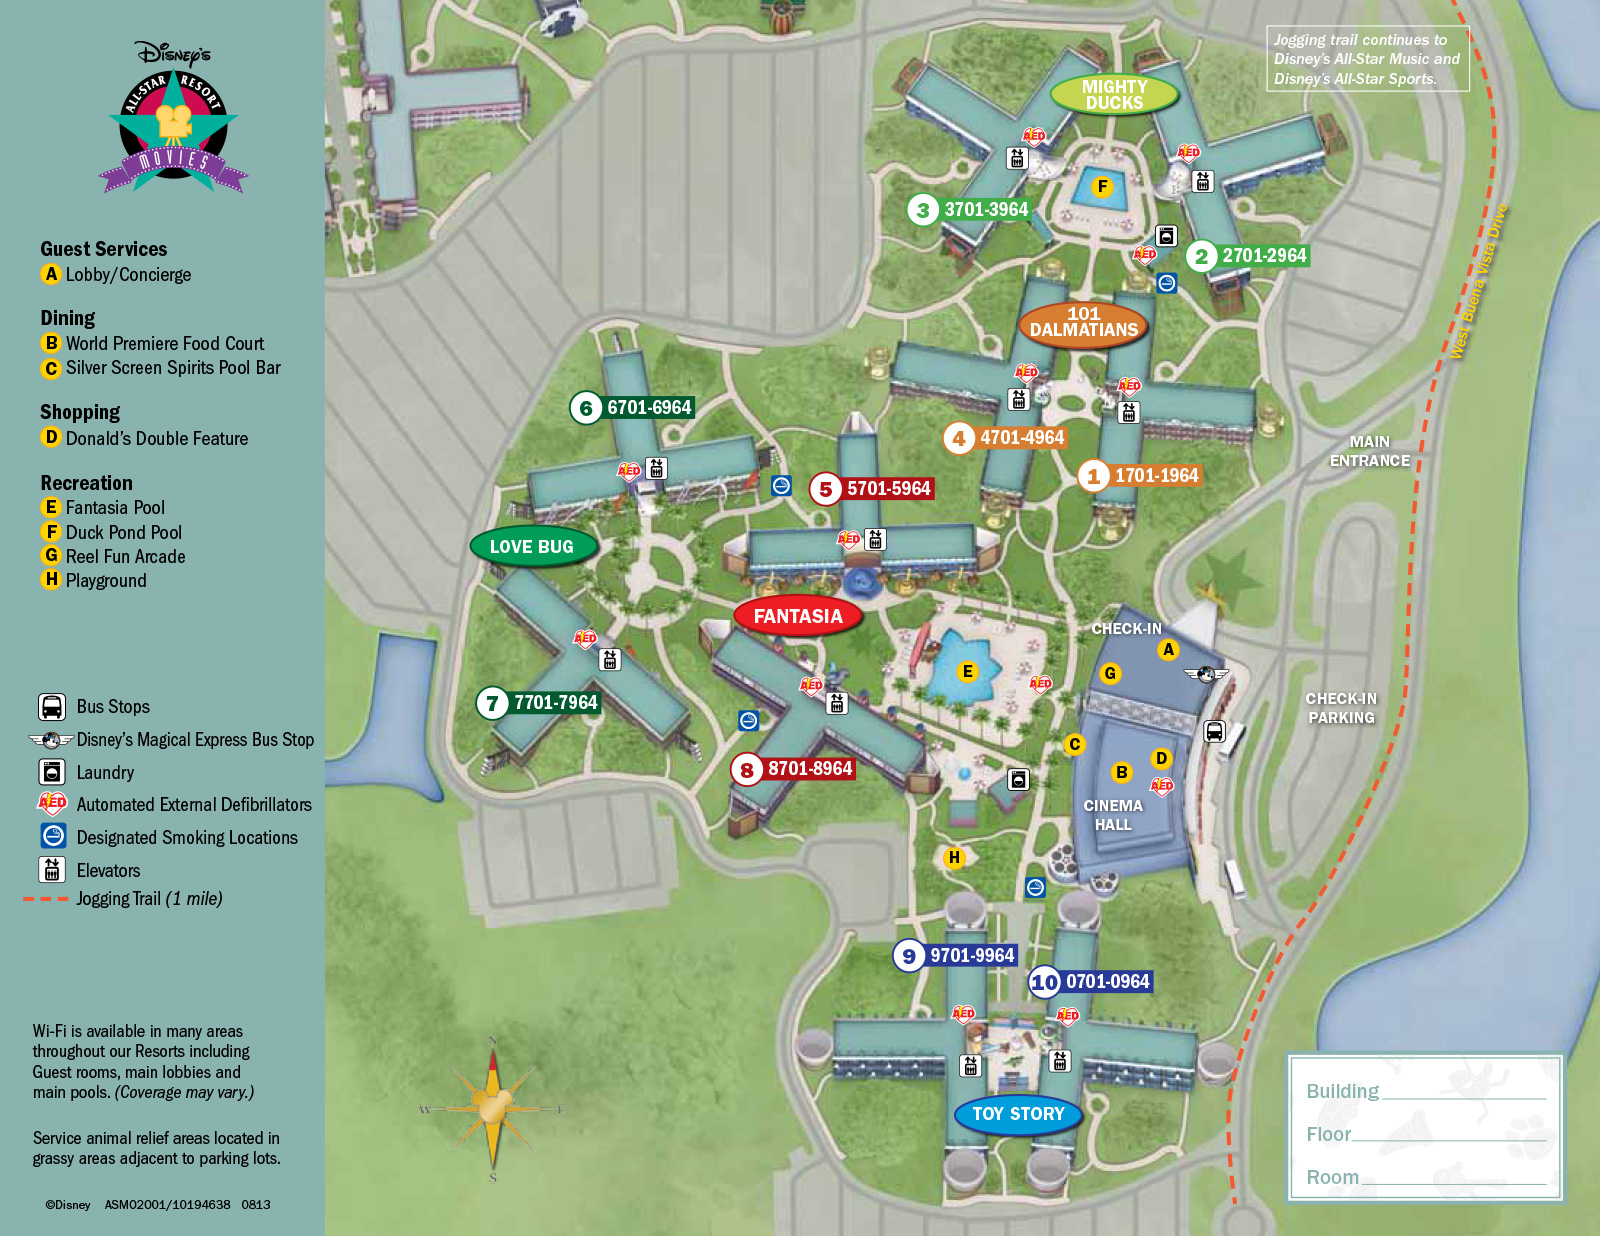 Photos New Design Of Maps Now At Walt Disney World Resort Hotels